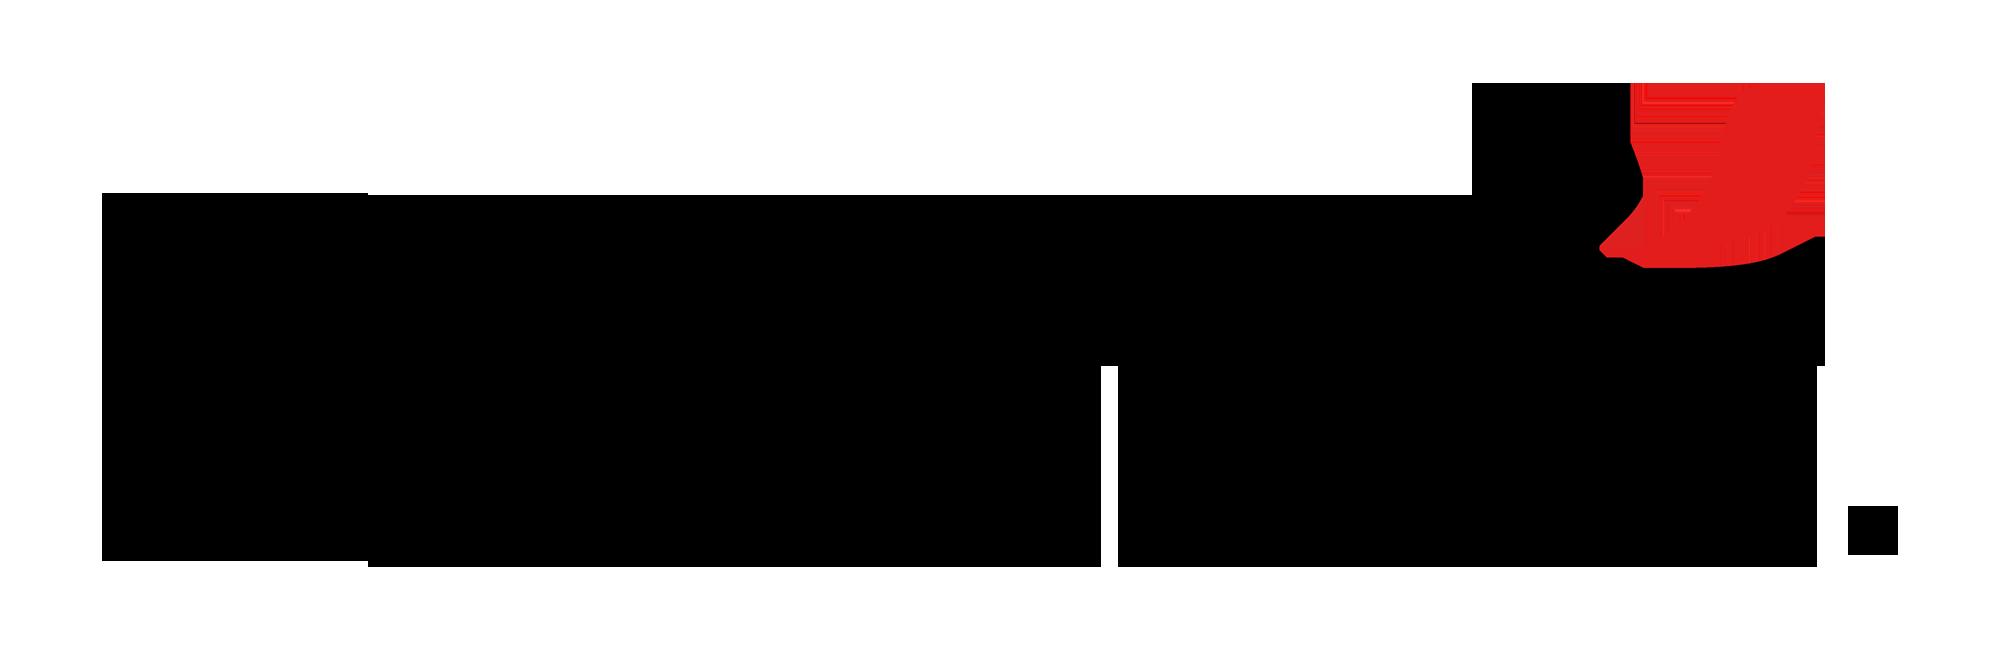 Nescafe - Logo